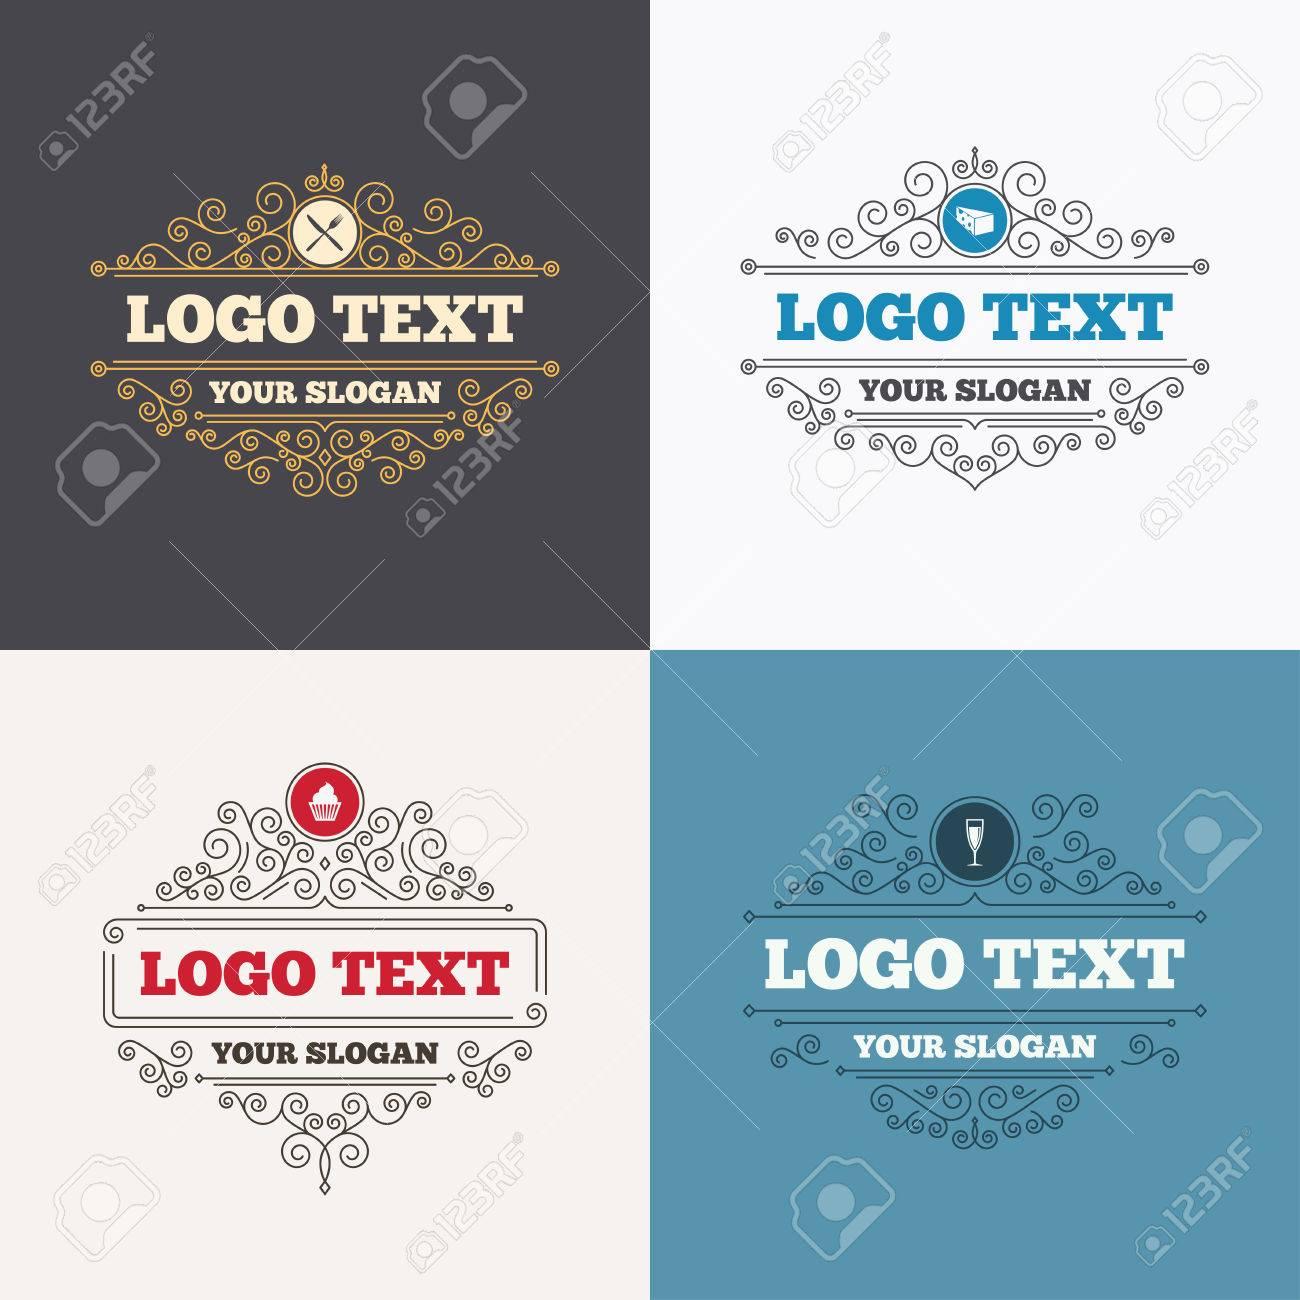 Flourishes Calligraphic Emblems Food Icons Muffin Cupcake Symbol